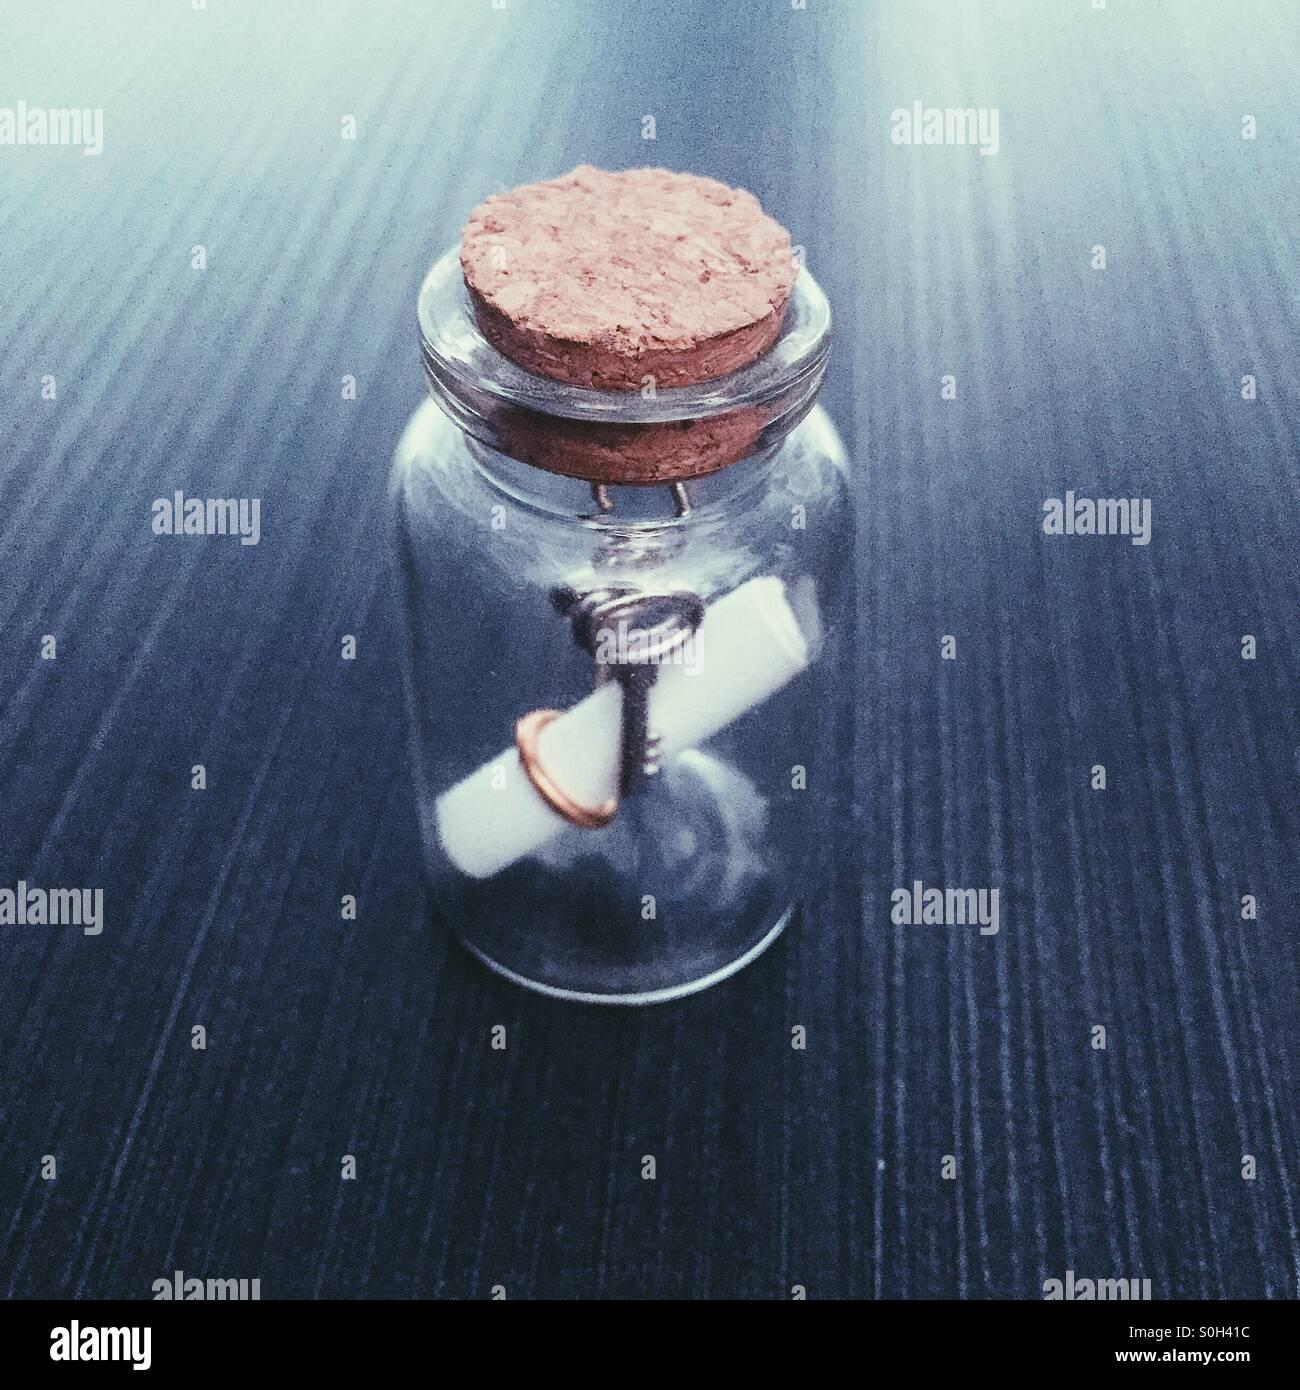 Jar with Keys Inside - Stock Image